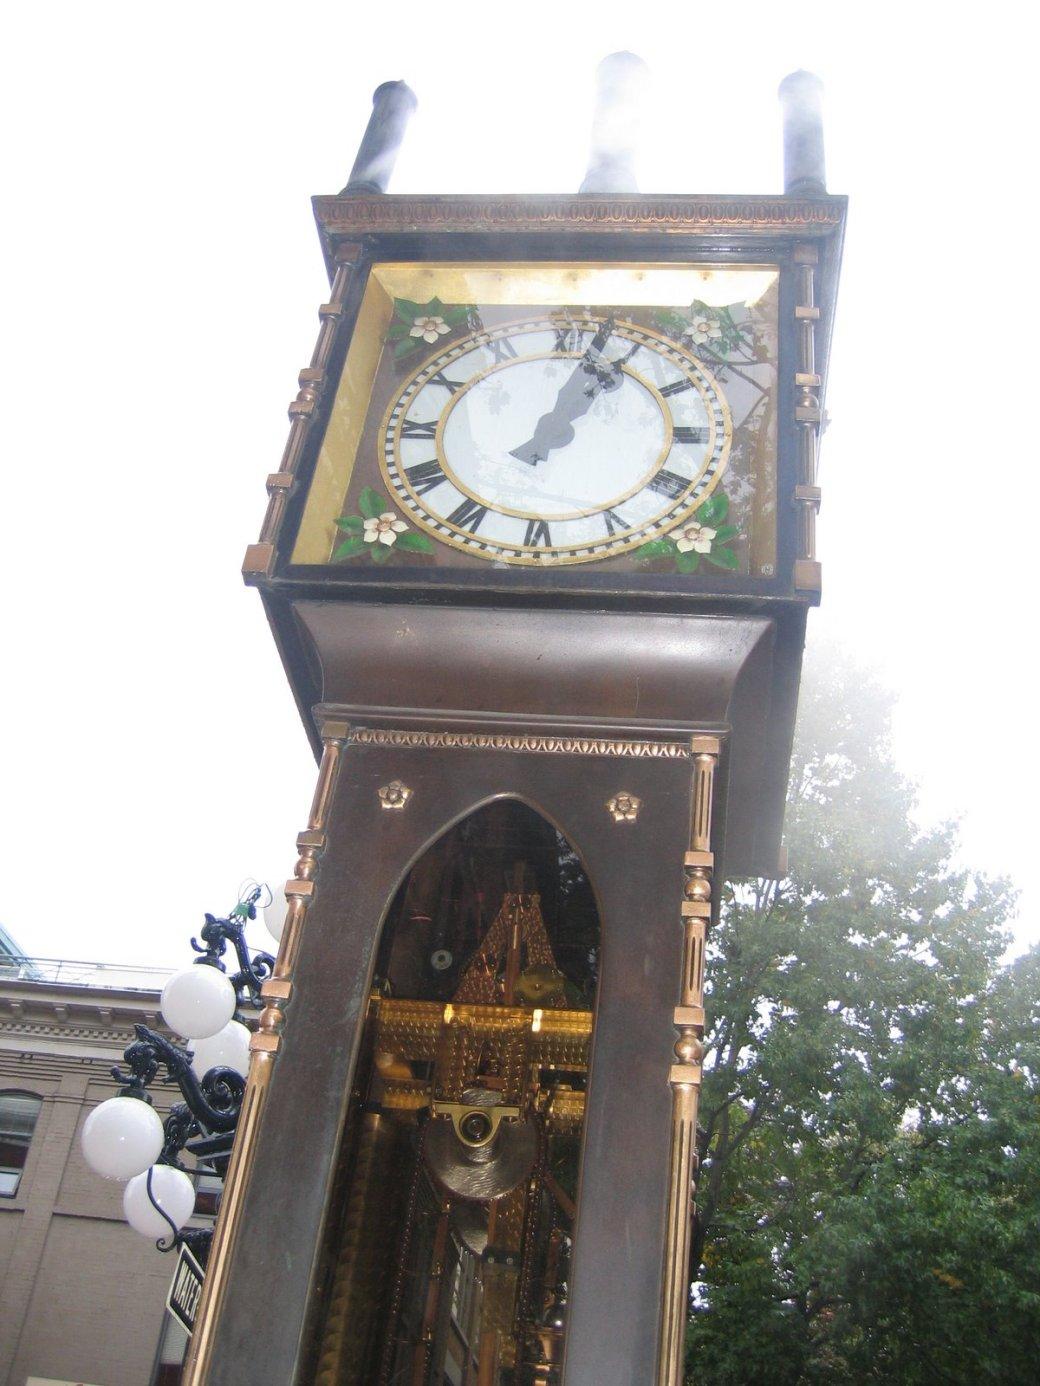 The clock!